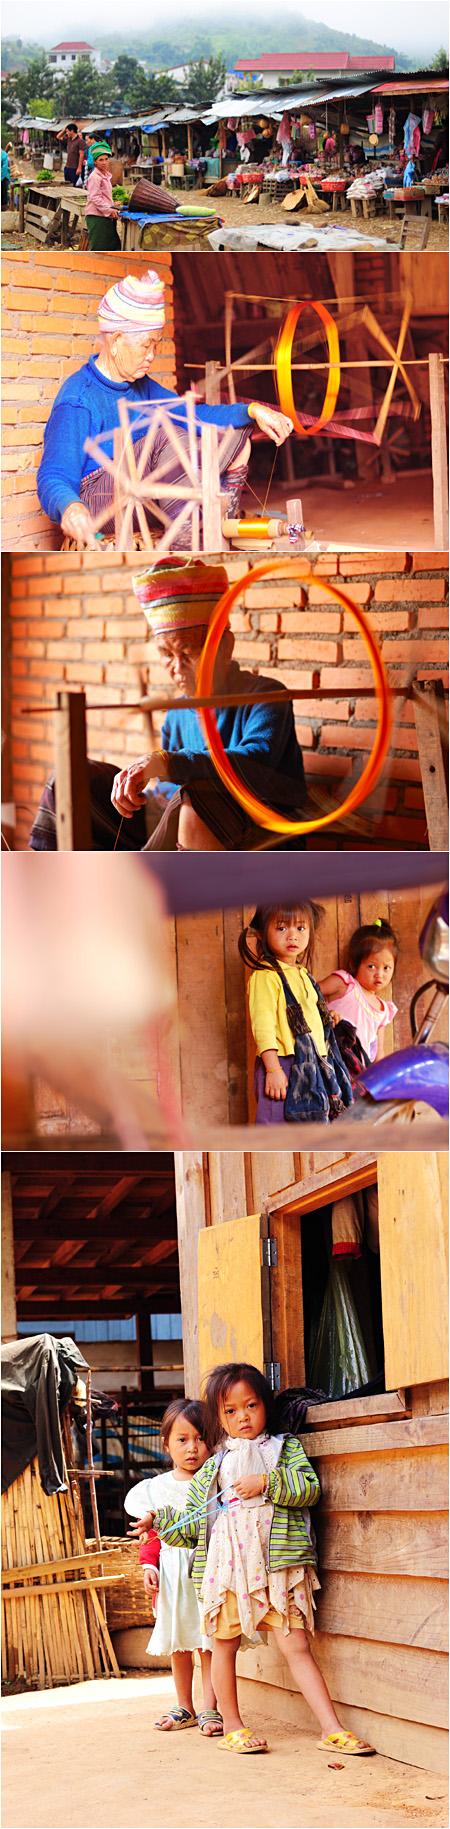 bvong_pix_laos_textile_village_1.jpg